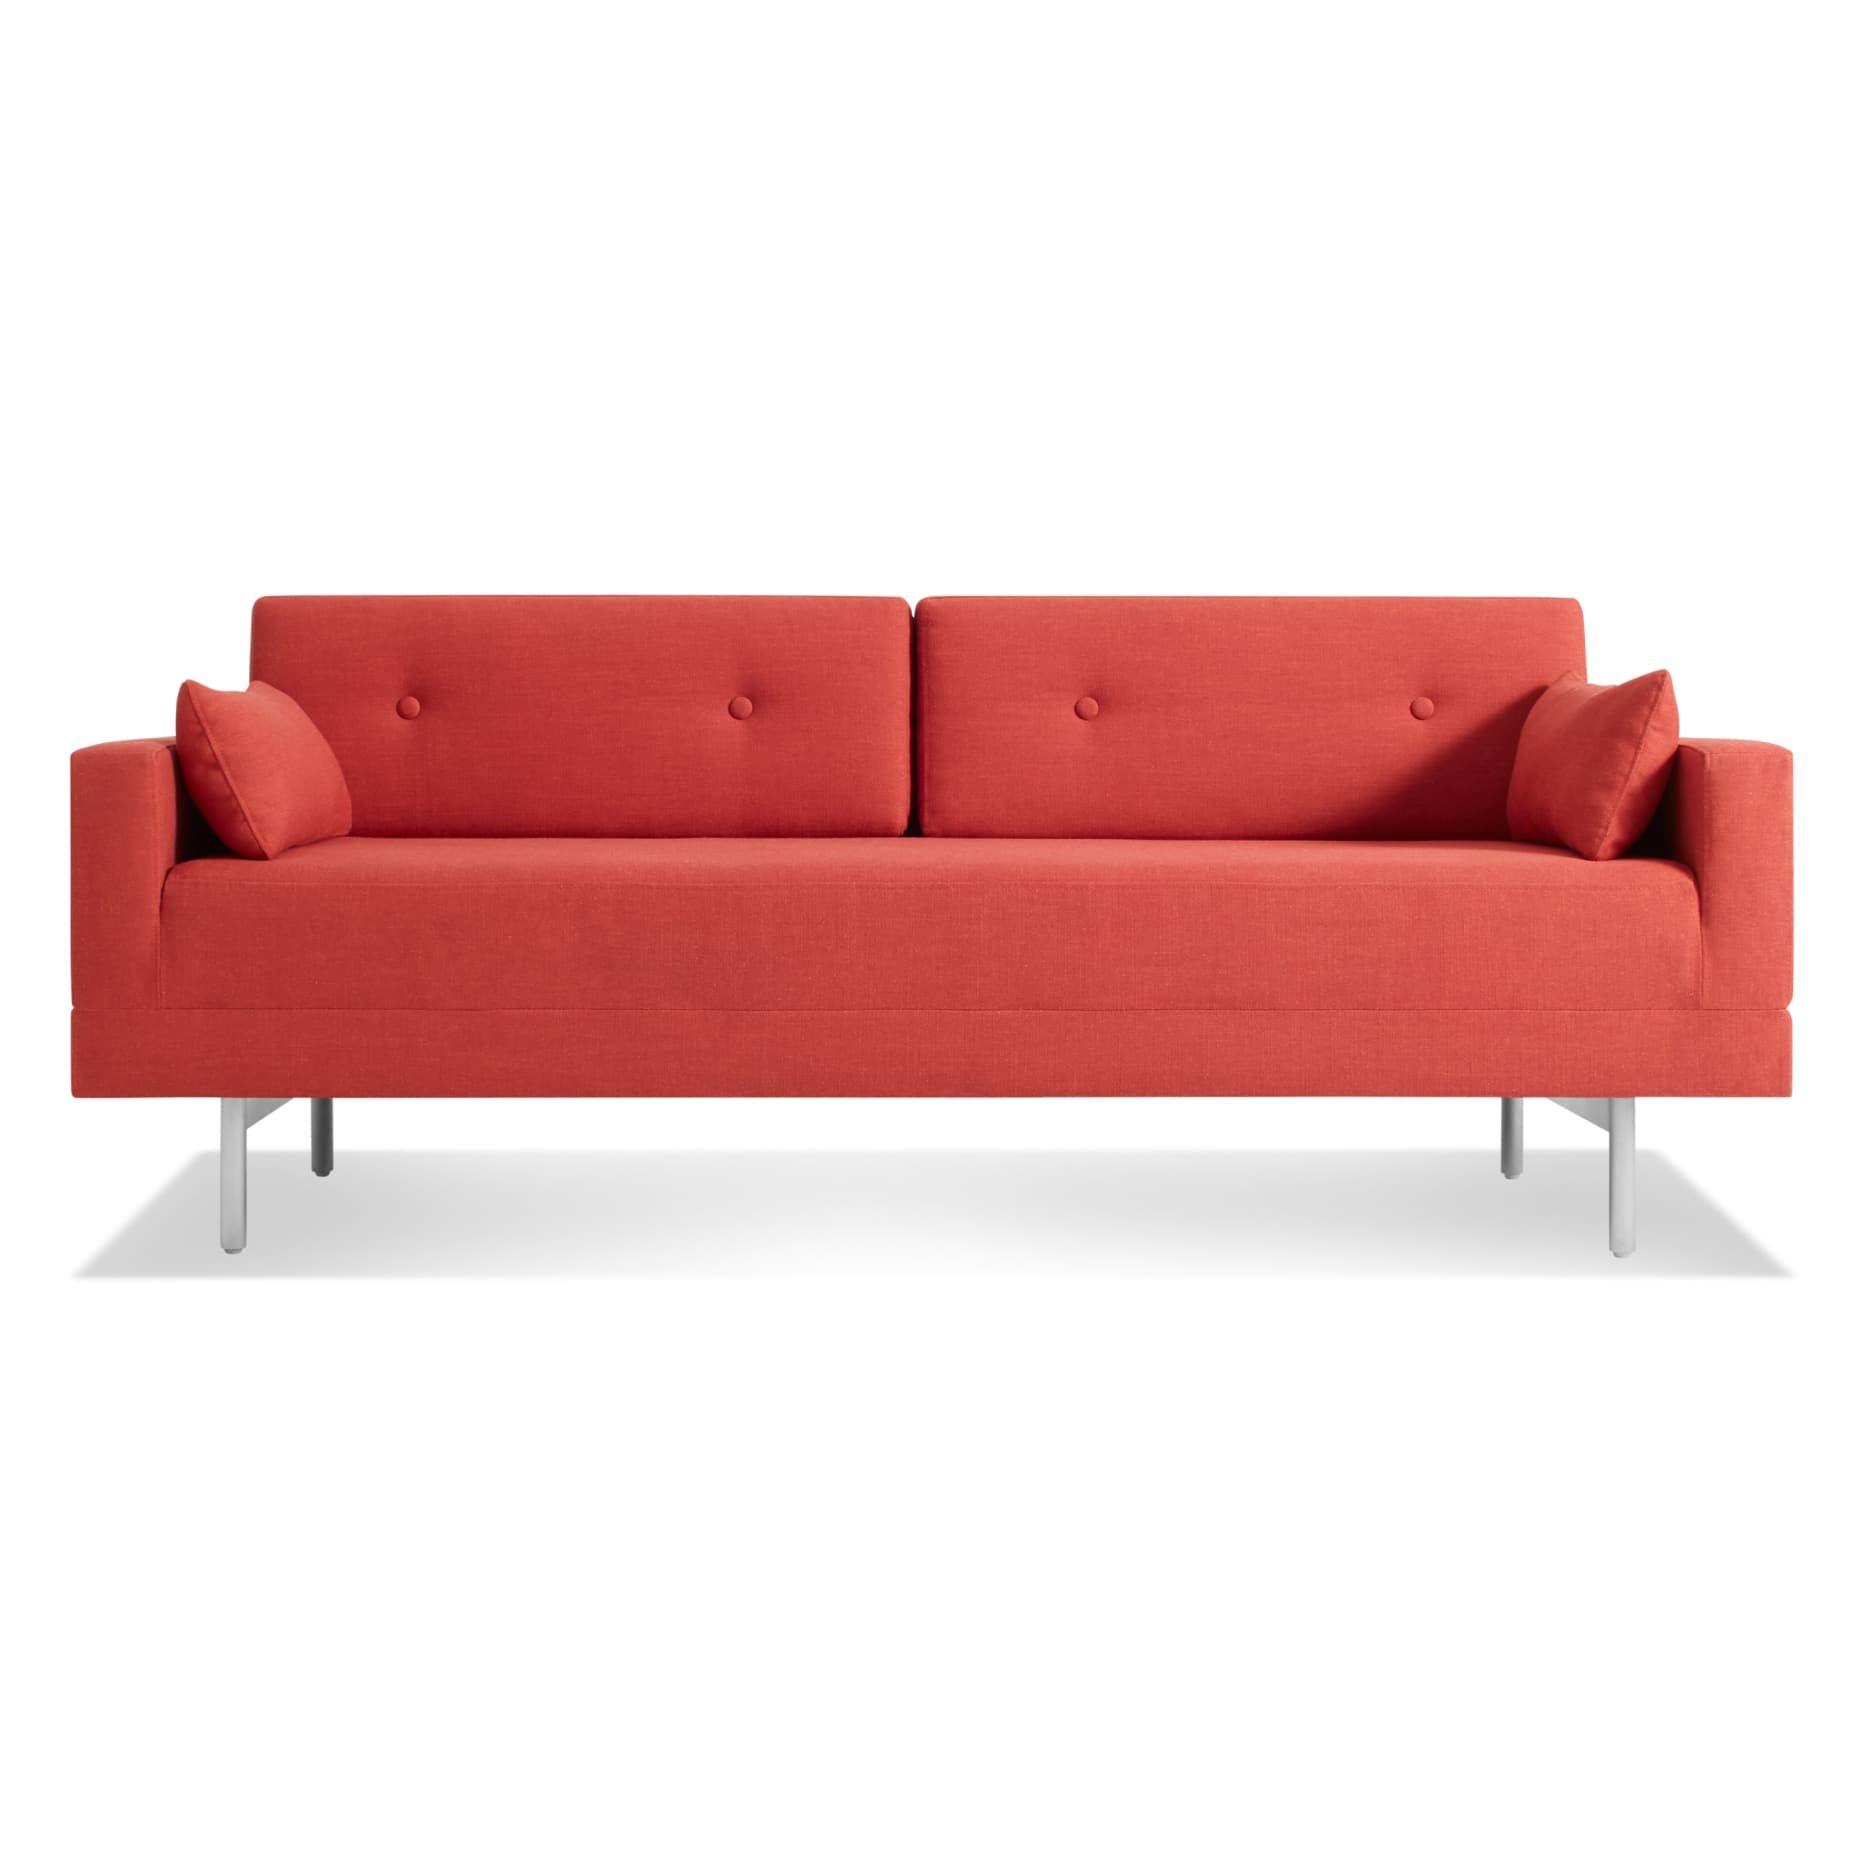 One Night Stand 80 Sleeper Sofa Modern Sleeper Sofa Comfortable Sofa Modern Sofa Bed